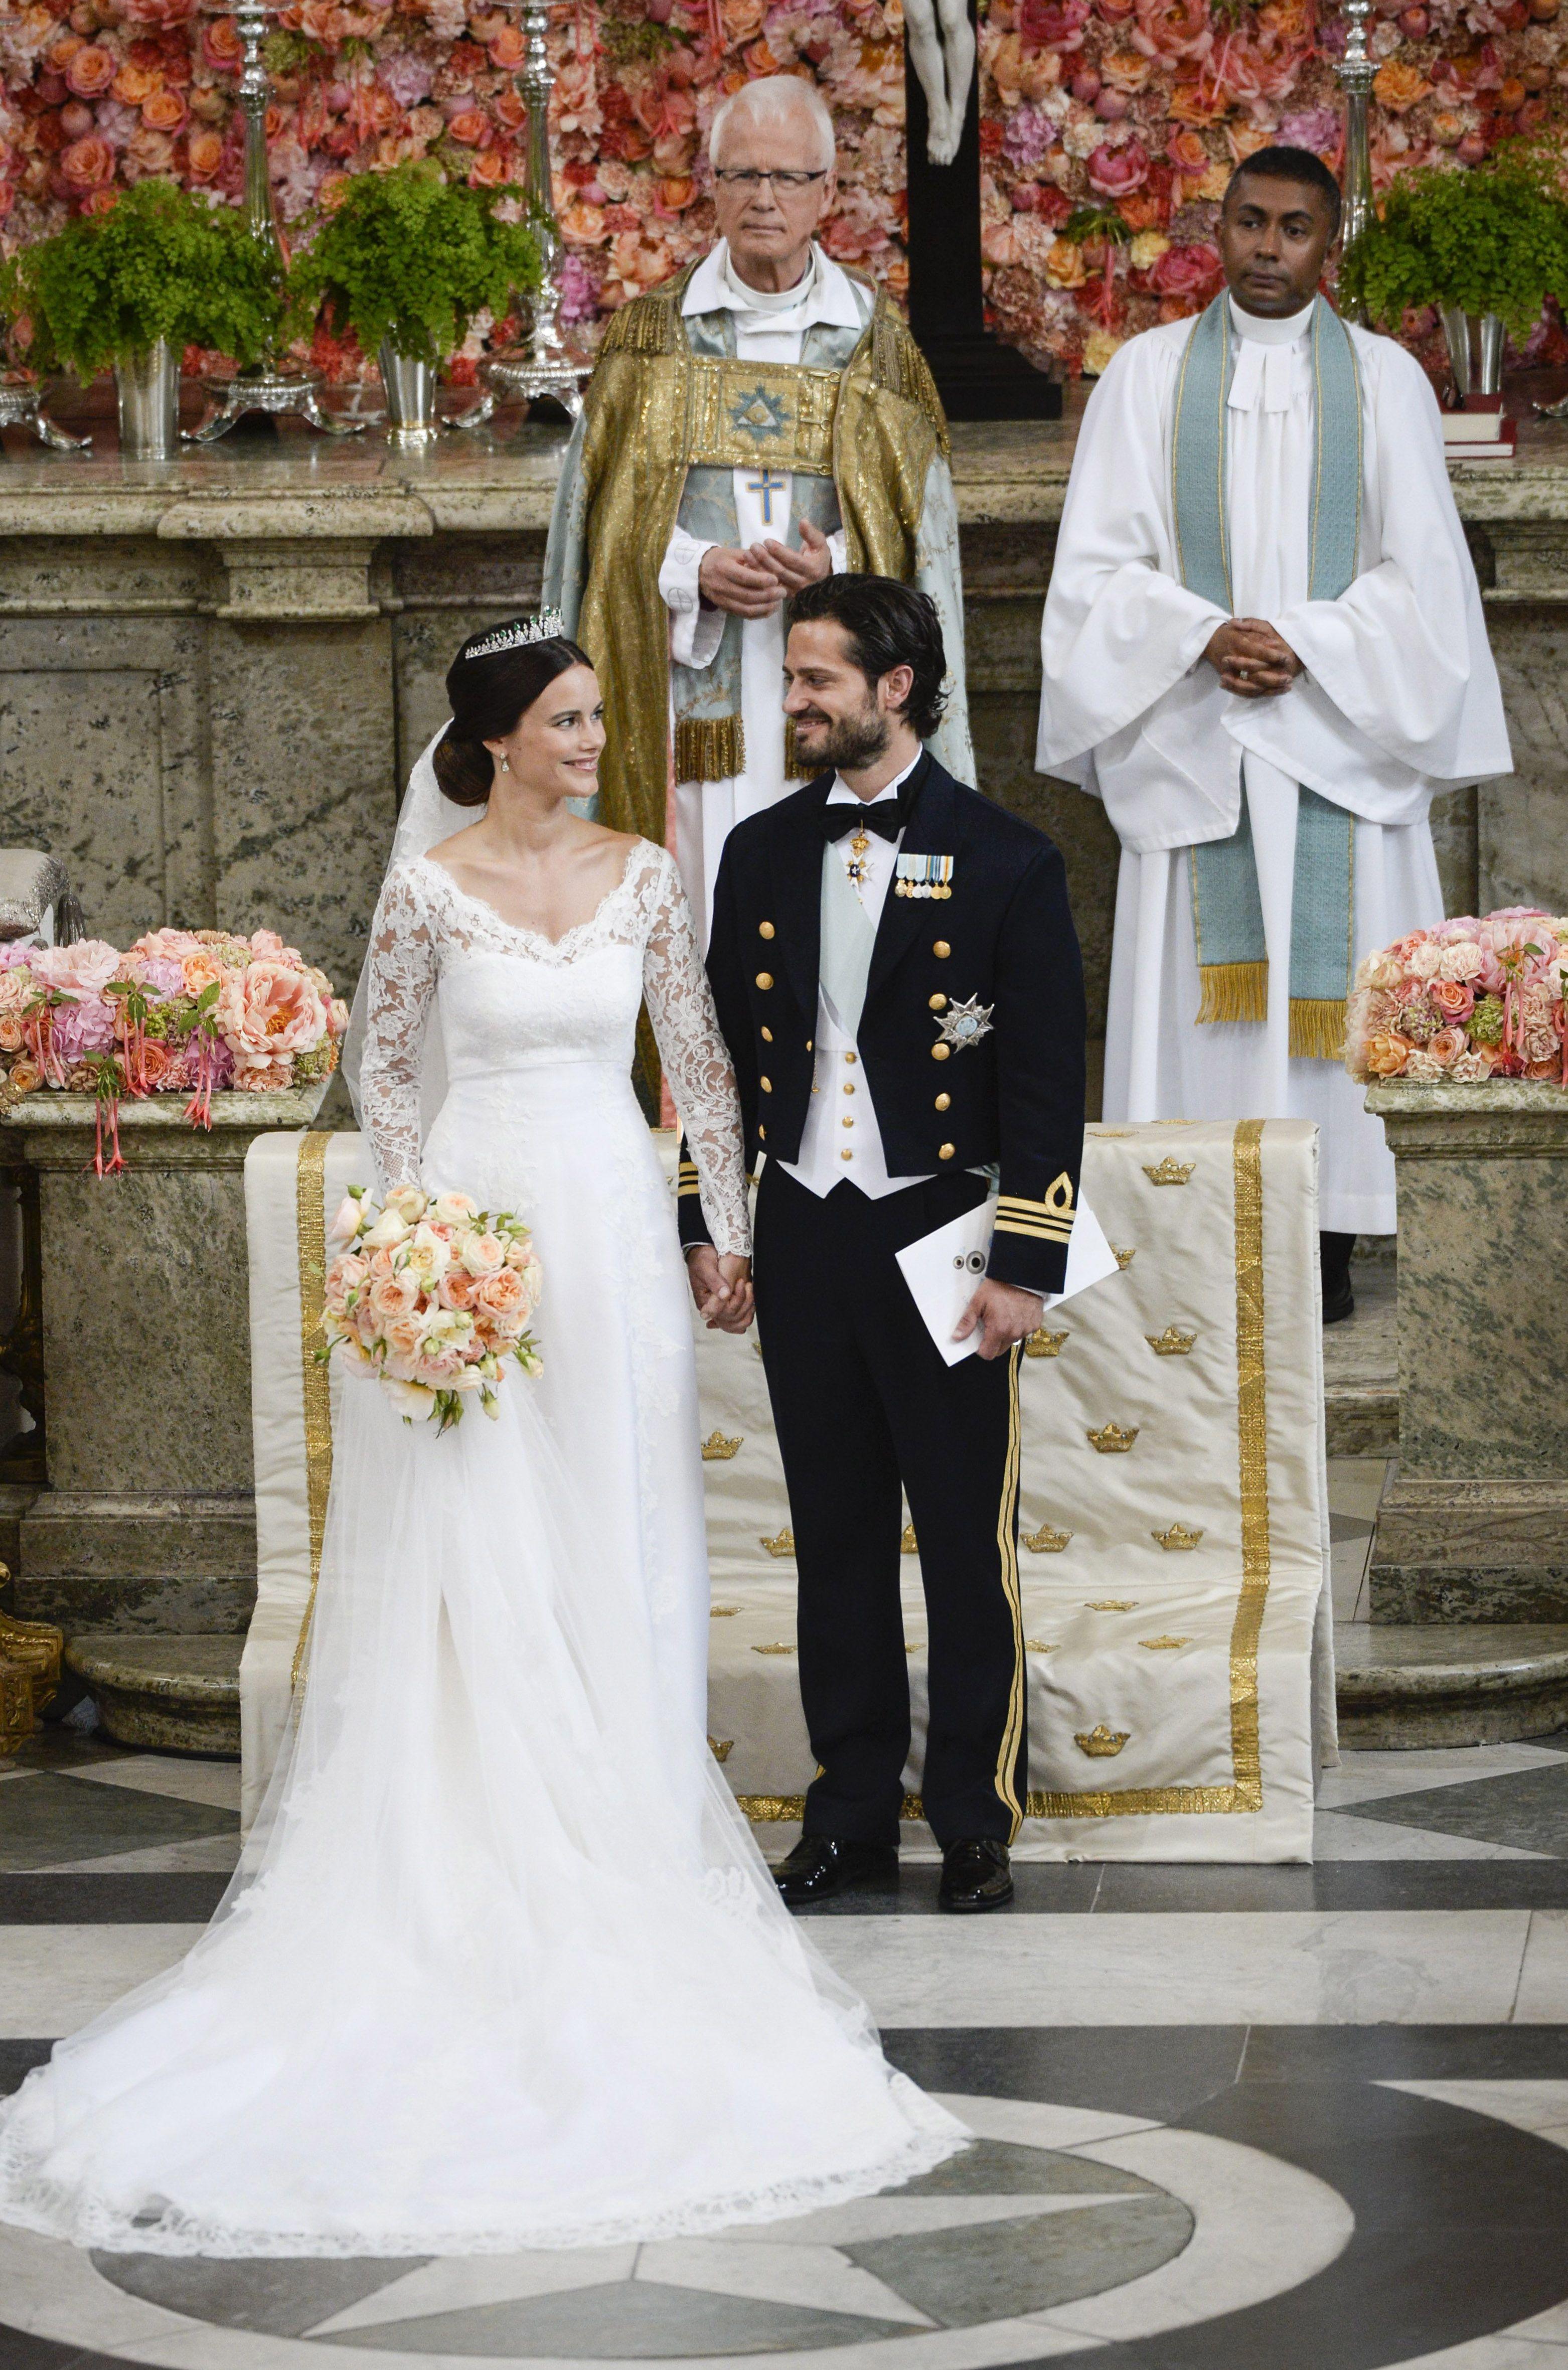 Sweden Royal Wedding Sofia Hellqvist Becomes A Princess Royal Wedding Gowns Royal Wedding Dress Royal Brides [ 4724 x 3126 Pixel ]